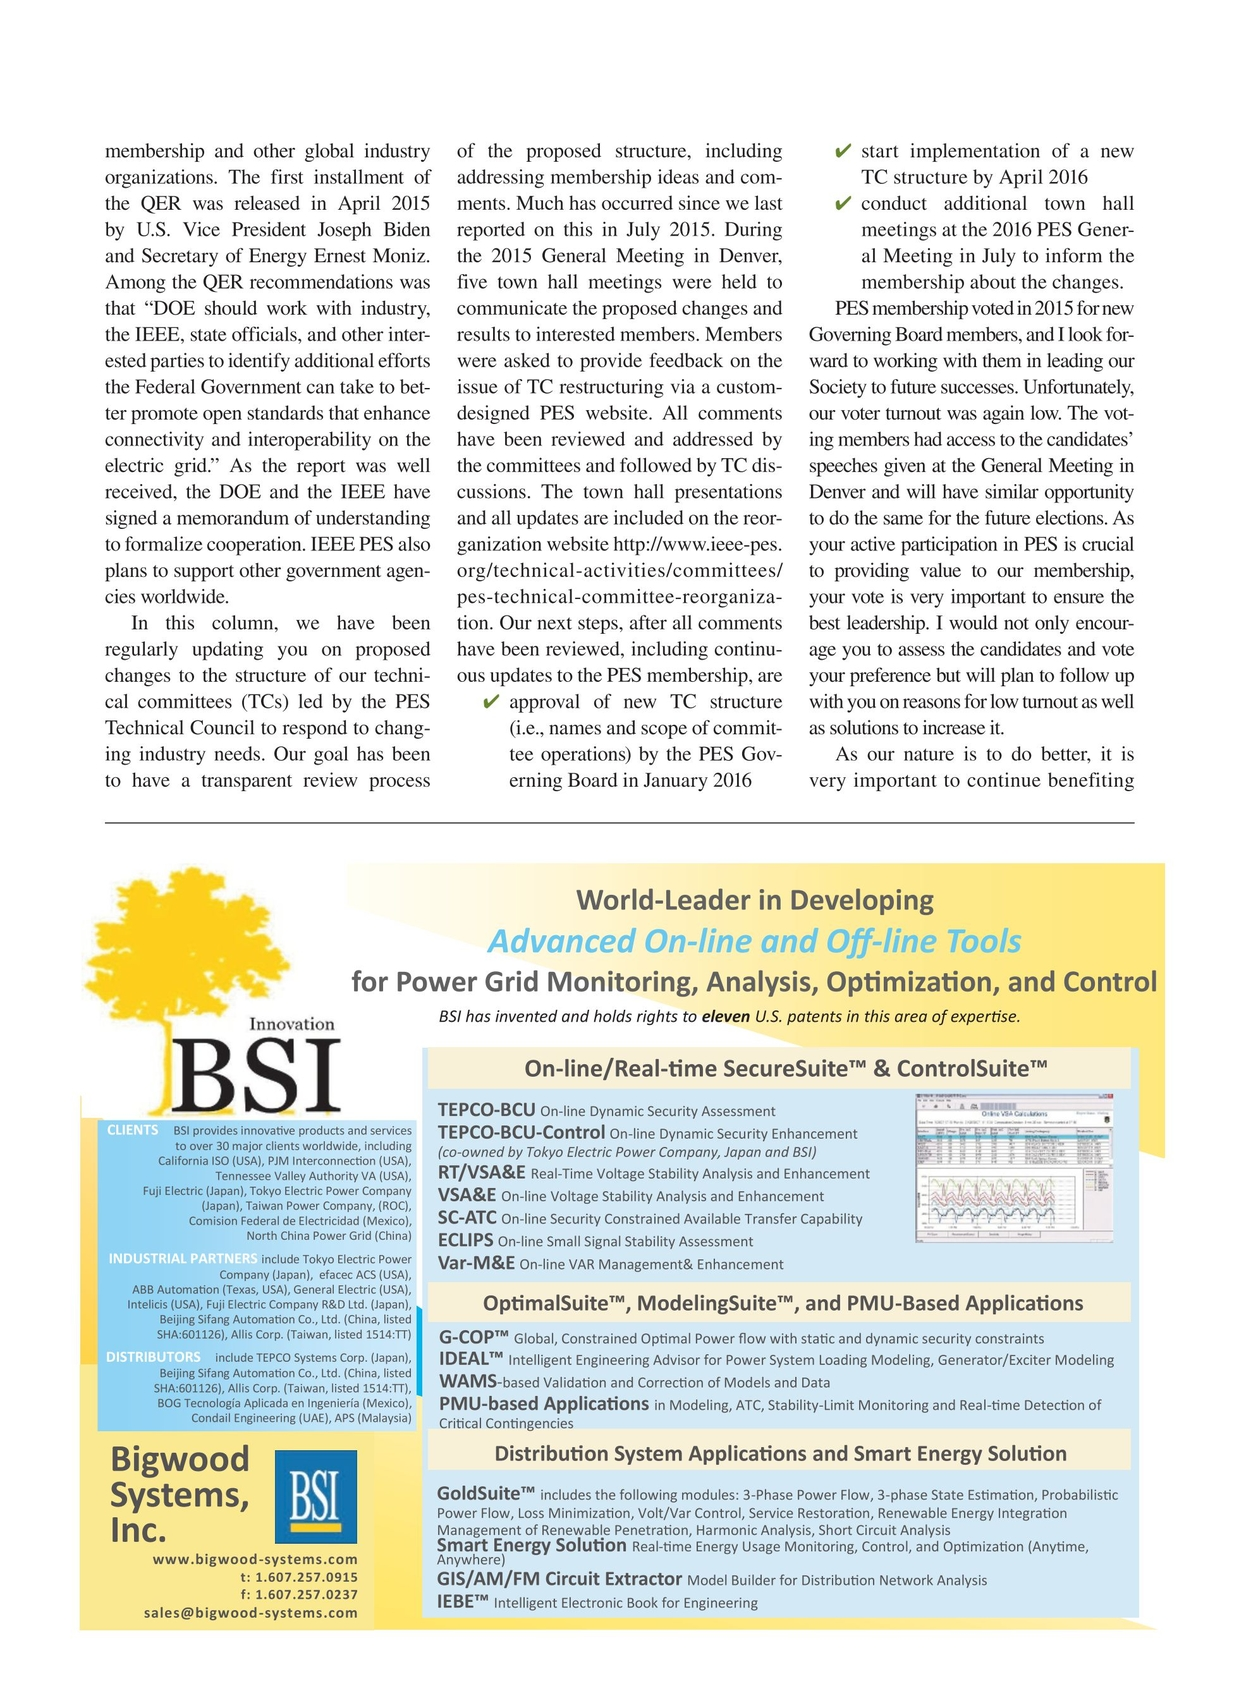 IEEE Power & Energy Magazine - January/February 2016